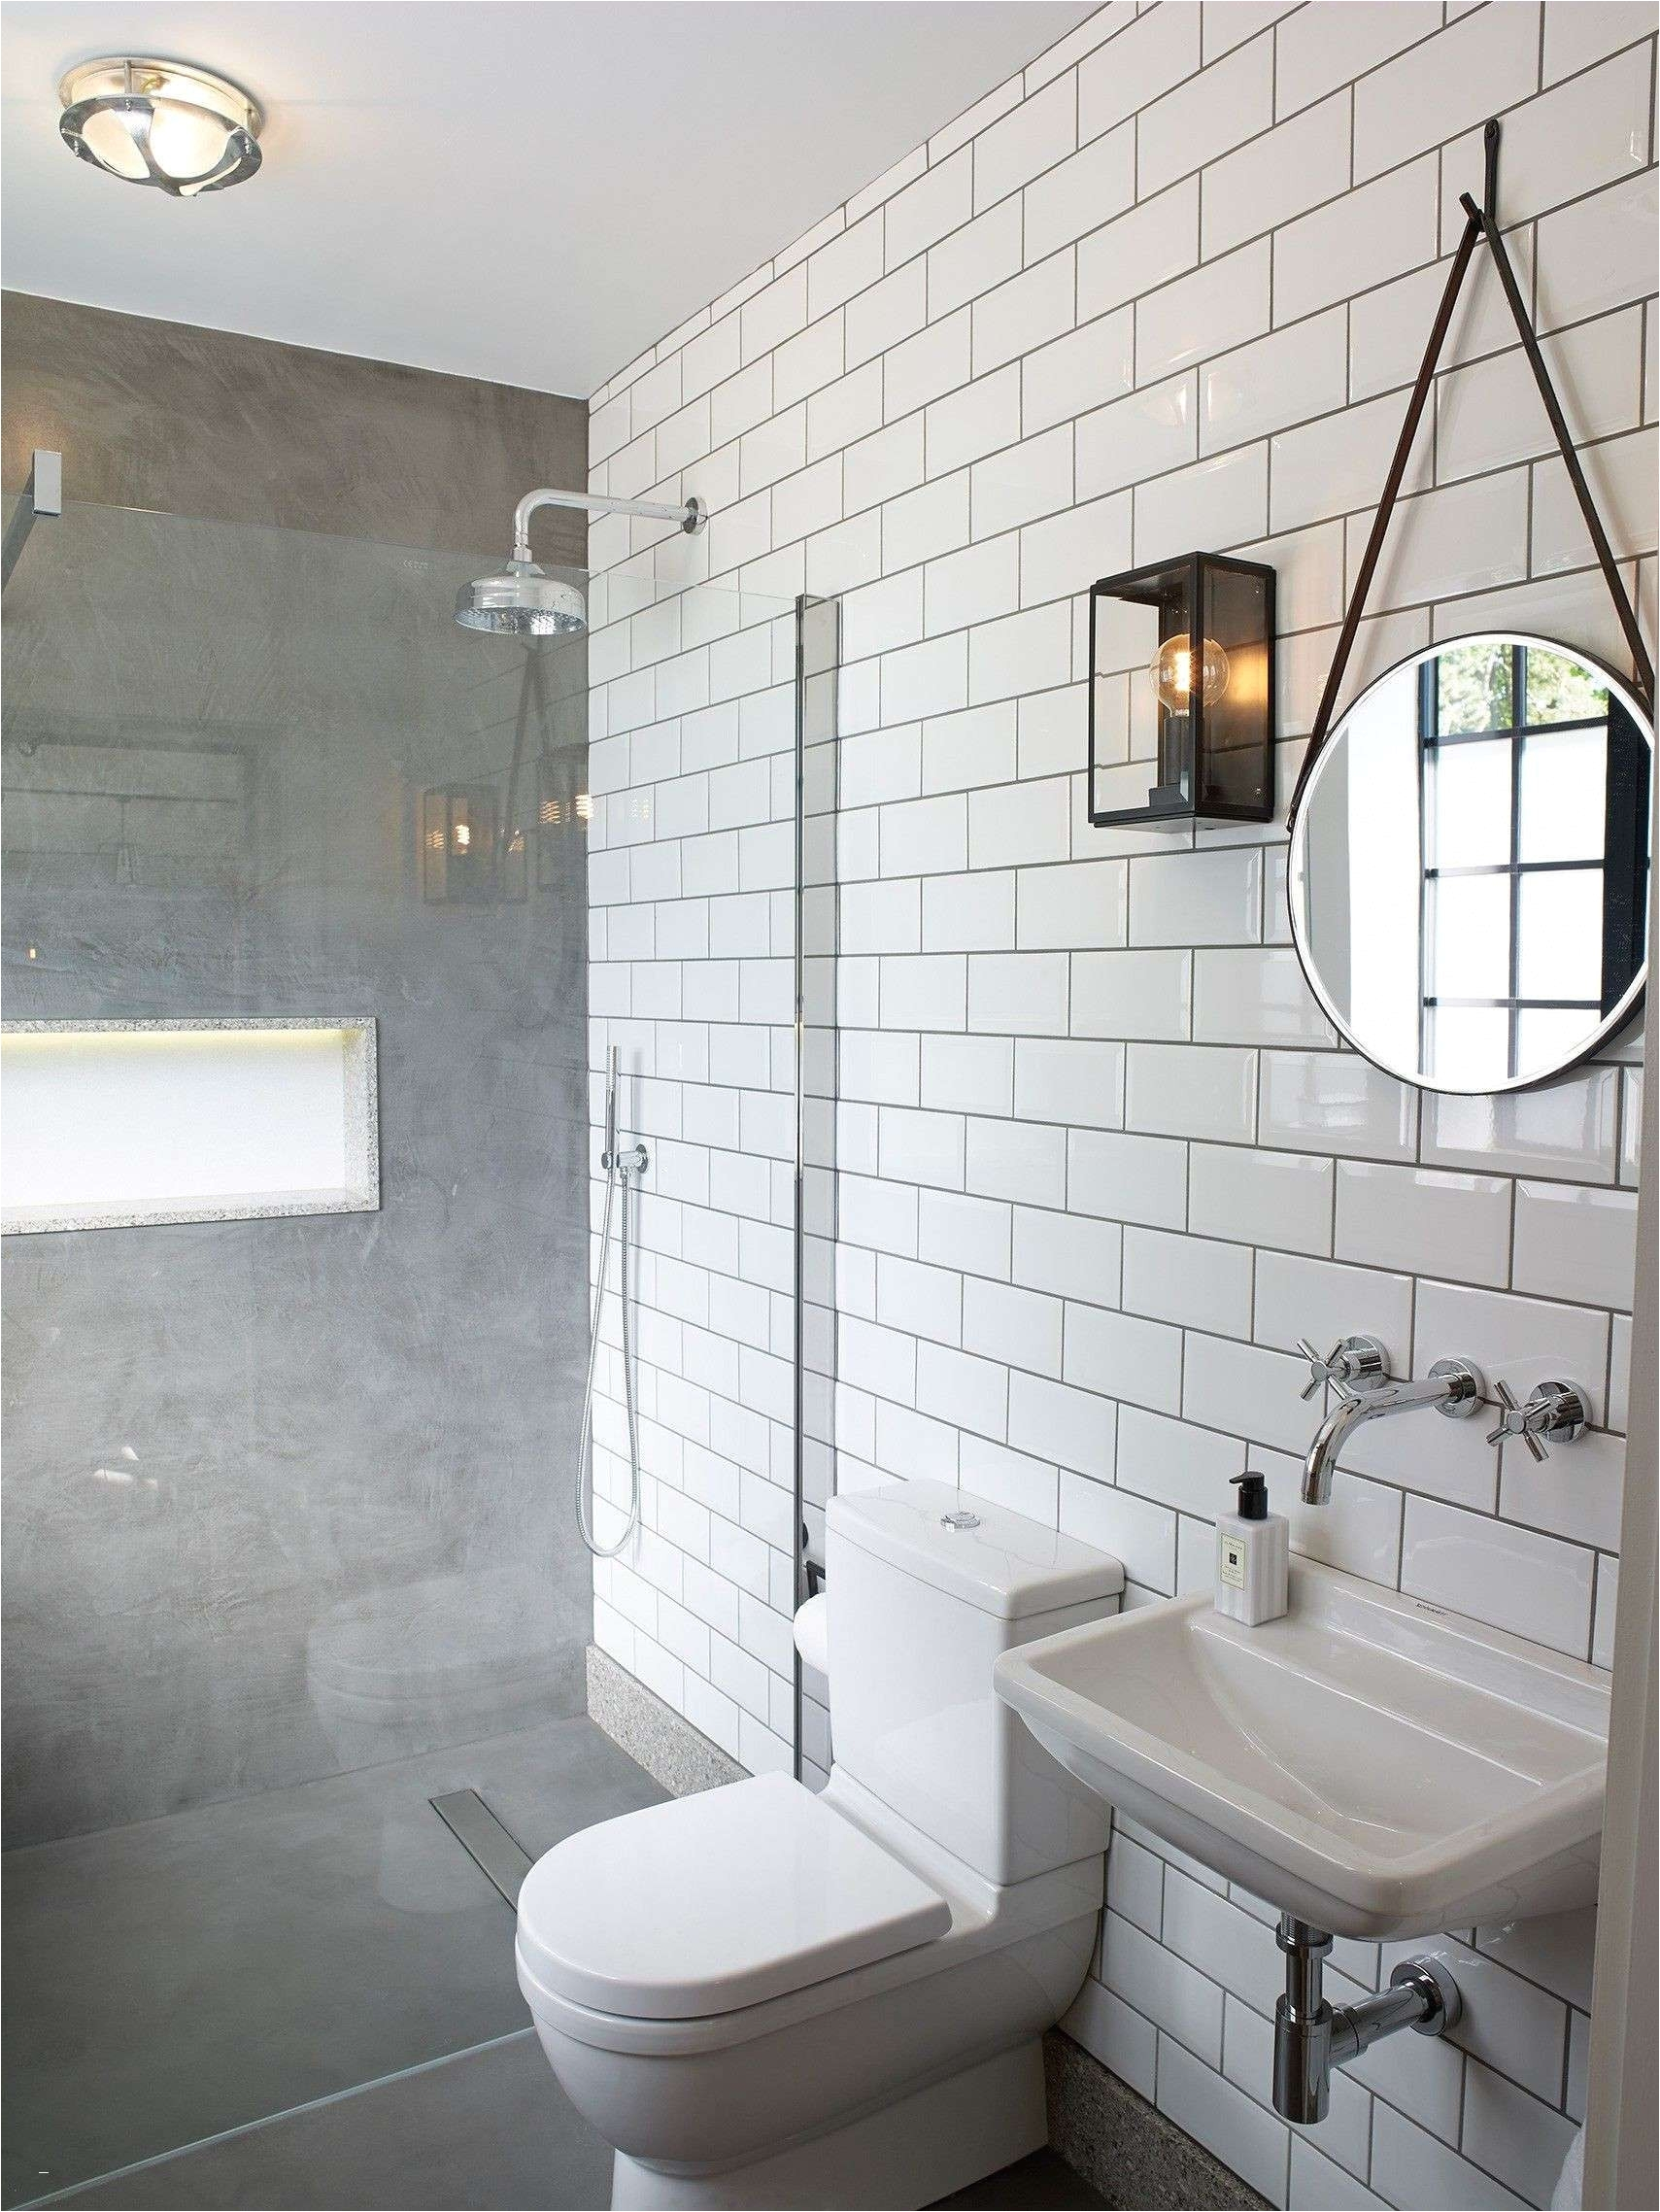 Small Spa Bathroom Design Ideas Bathroom Wall Decorating Ideas Small Bathrooms Inspirational